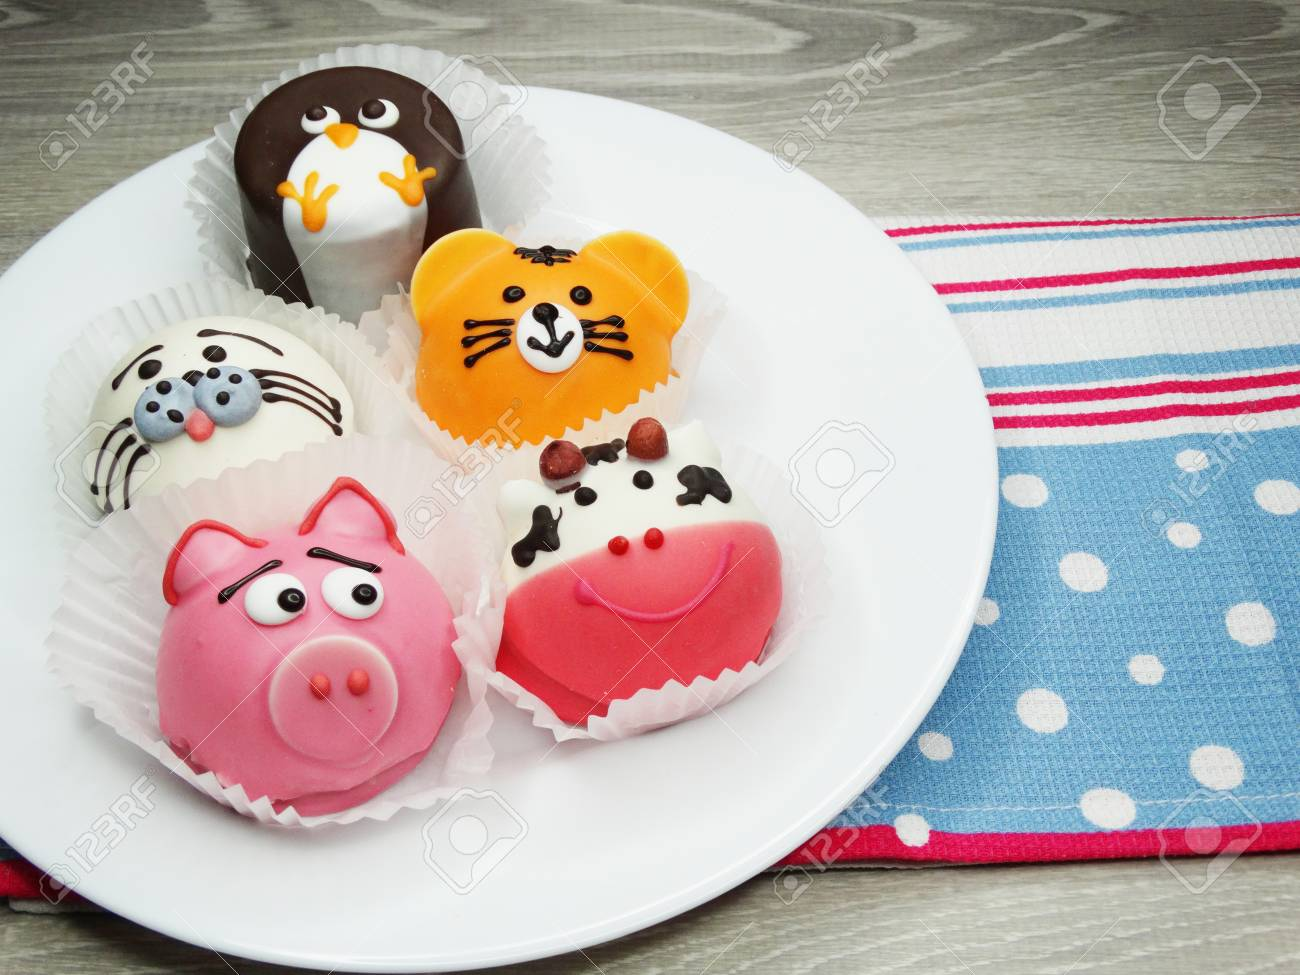 Kreative Geback Essen Kuchen Lustig Lustige Tiere Fur Kinder